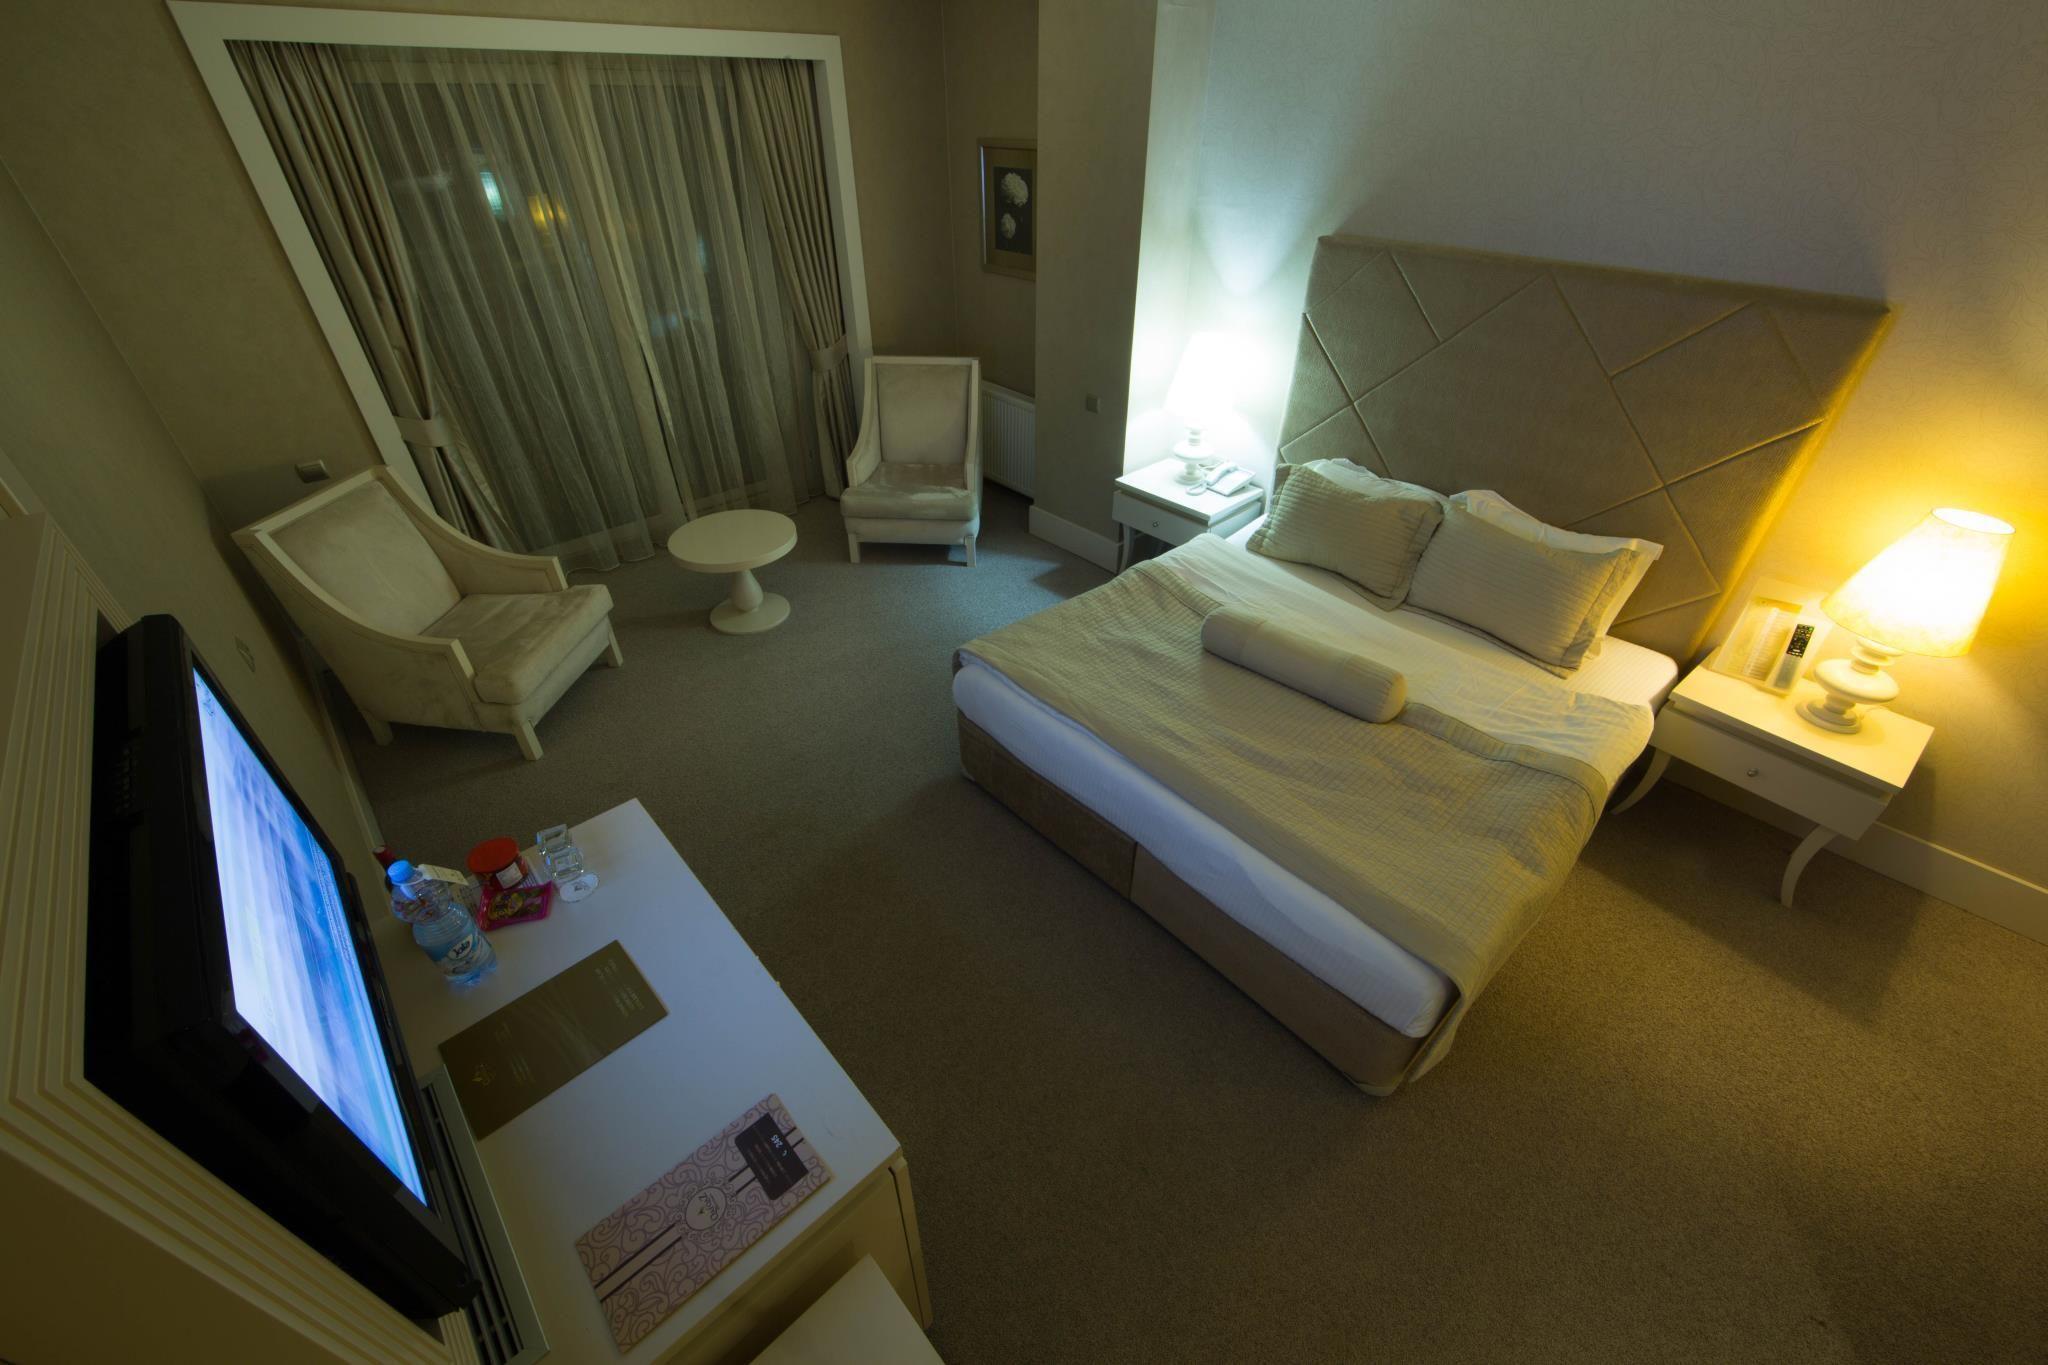 Gabala Qafqaz Riverside Resort Hotel Azerbaijan Europe The 5 Star Qafqaz Riverside Resort Hotel Offers Comfort And C Riverside Resort Hotel Hotels And Resorts